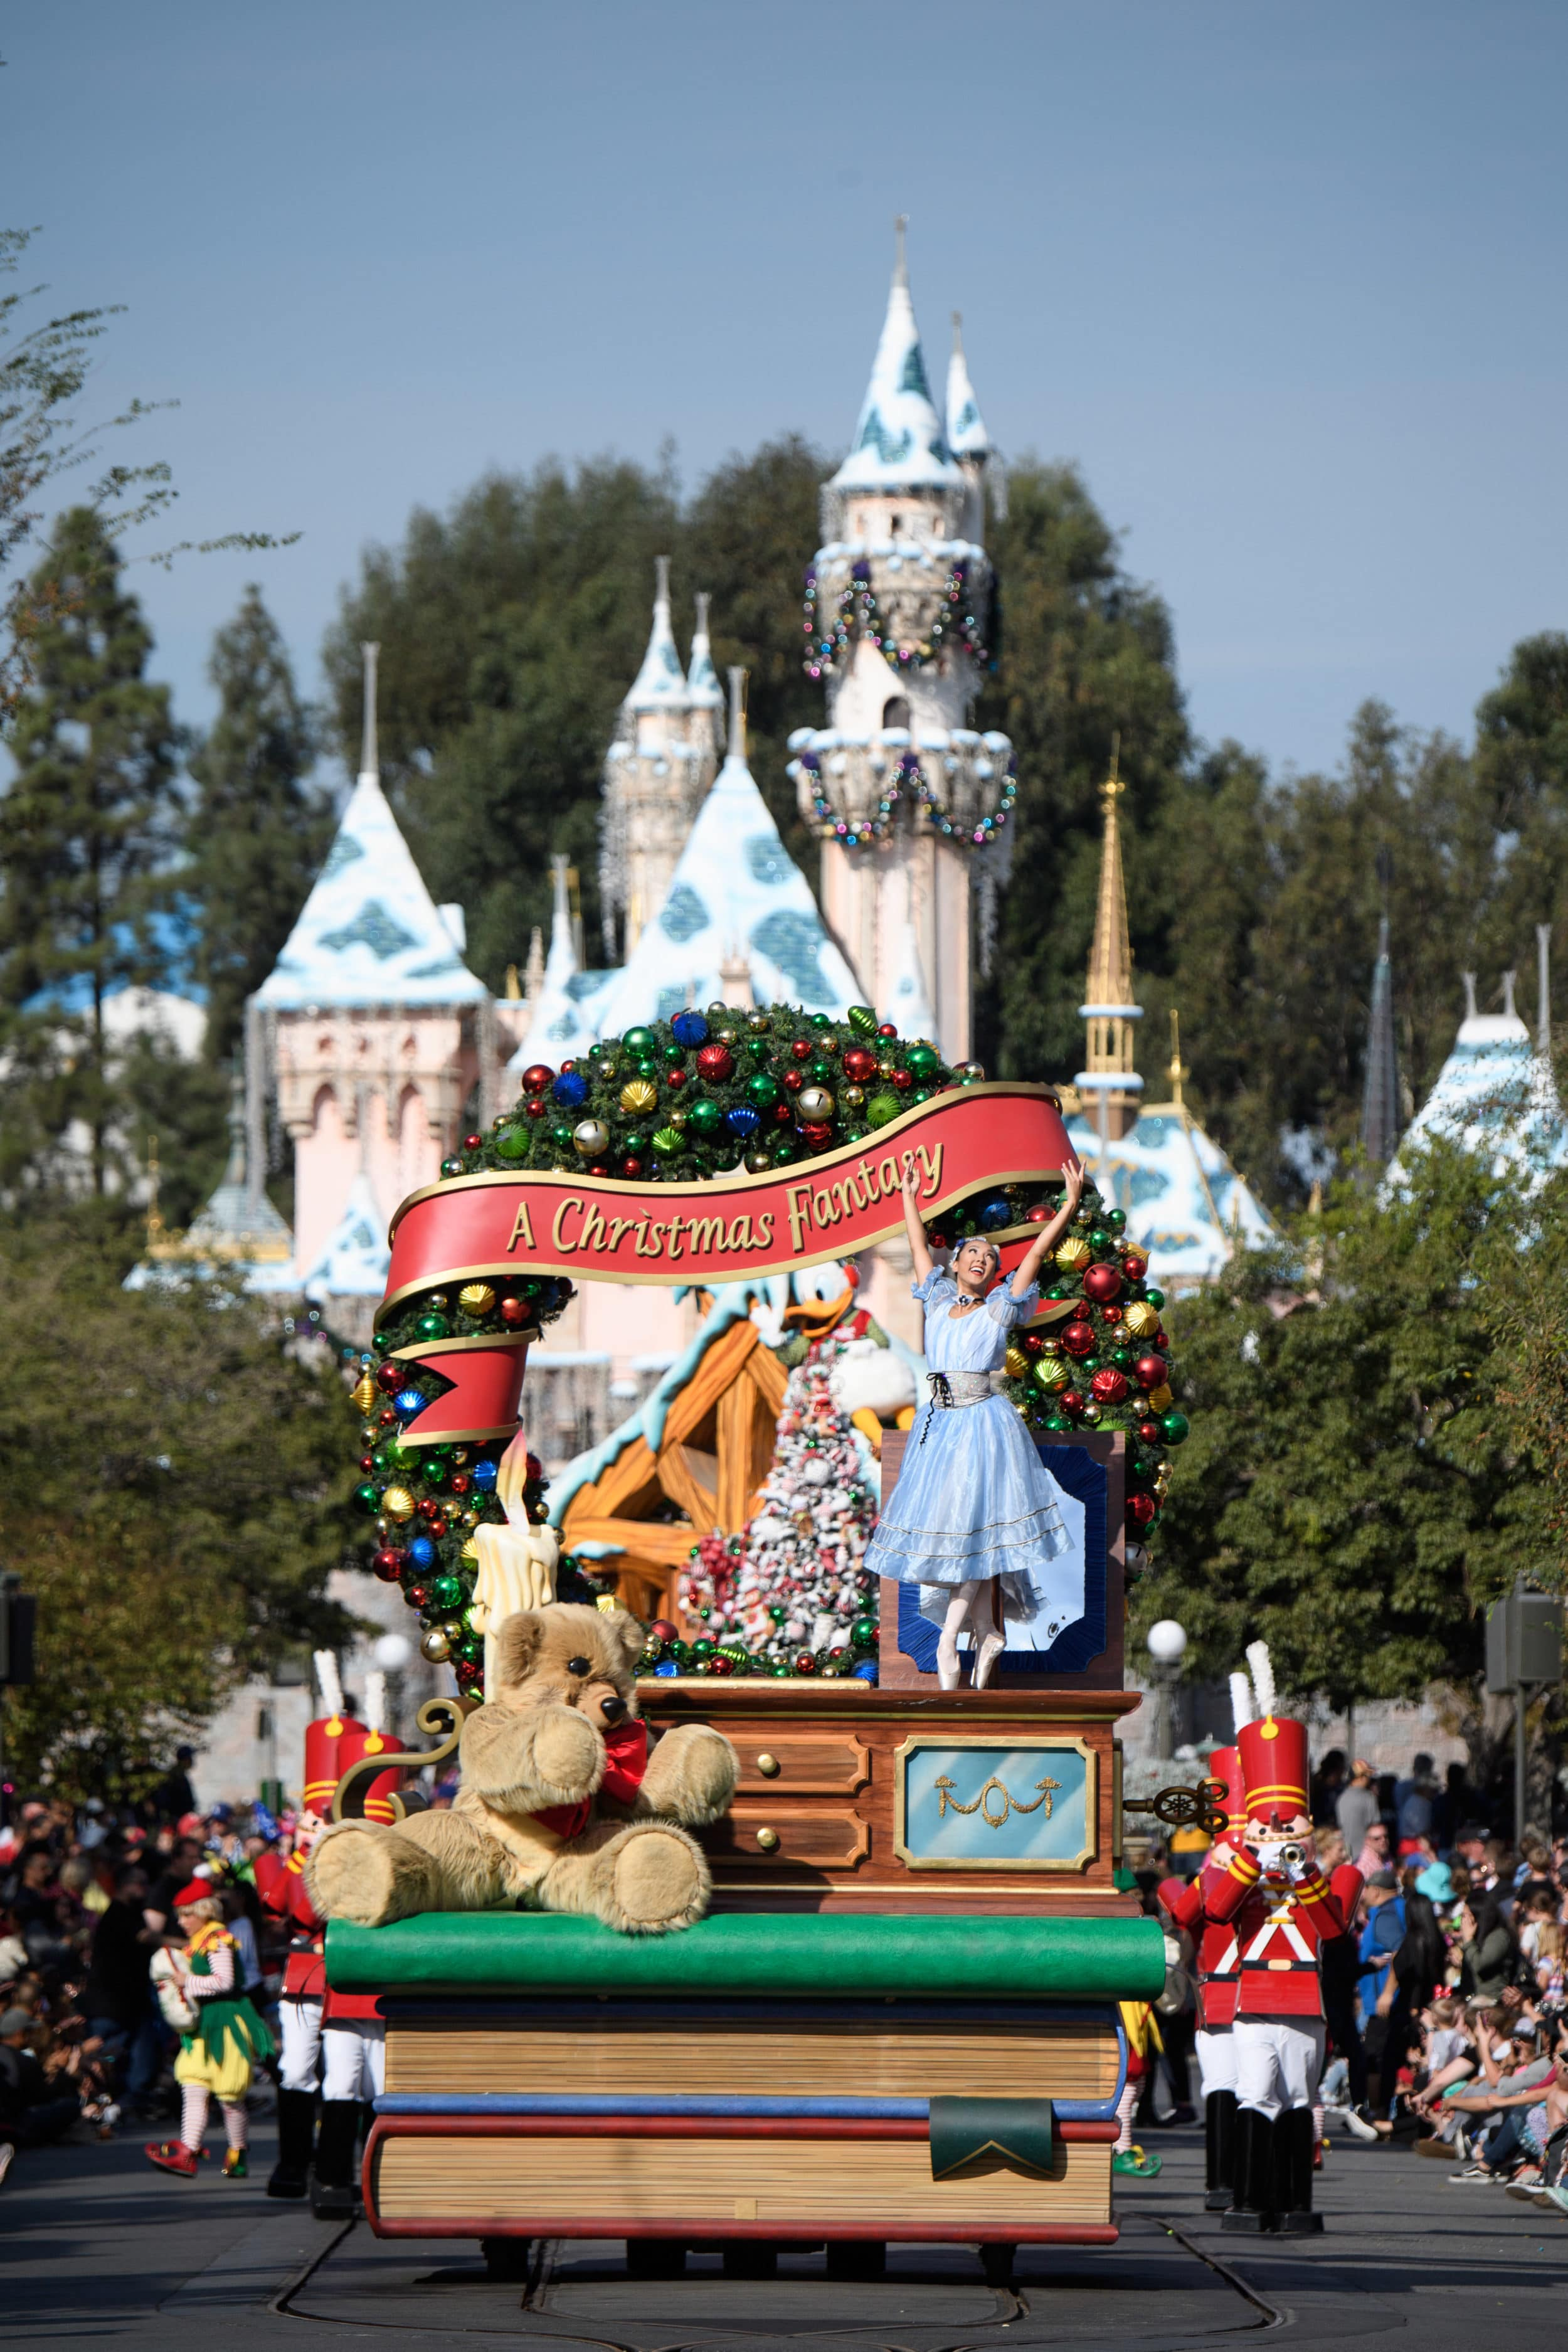 Christmas Fantasy Parade and more during the holidays at Disneyland Resort in California.